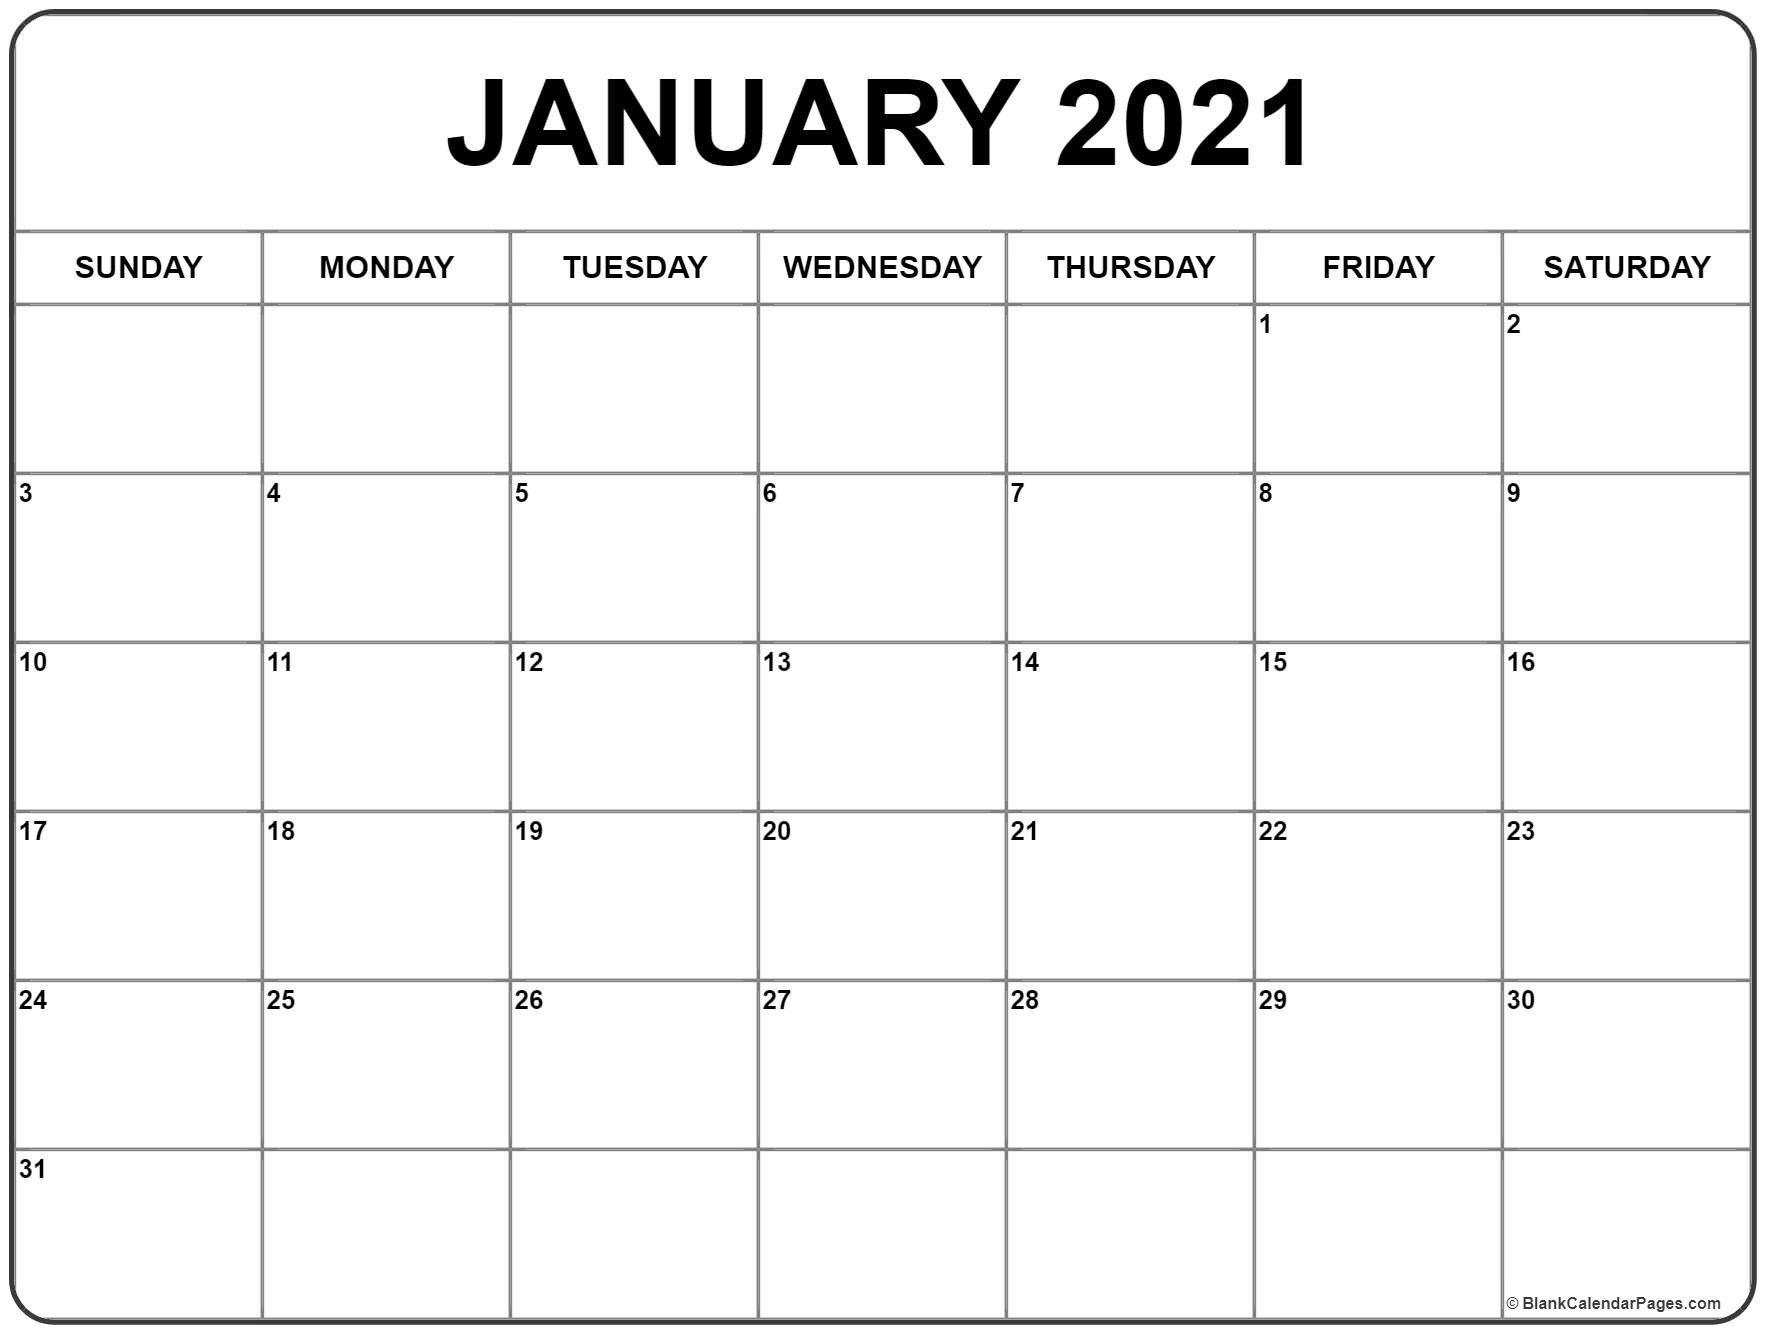 Get Blank Calendar 2021